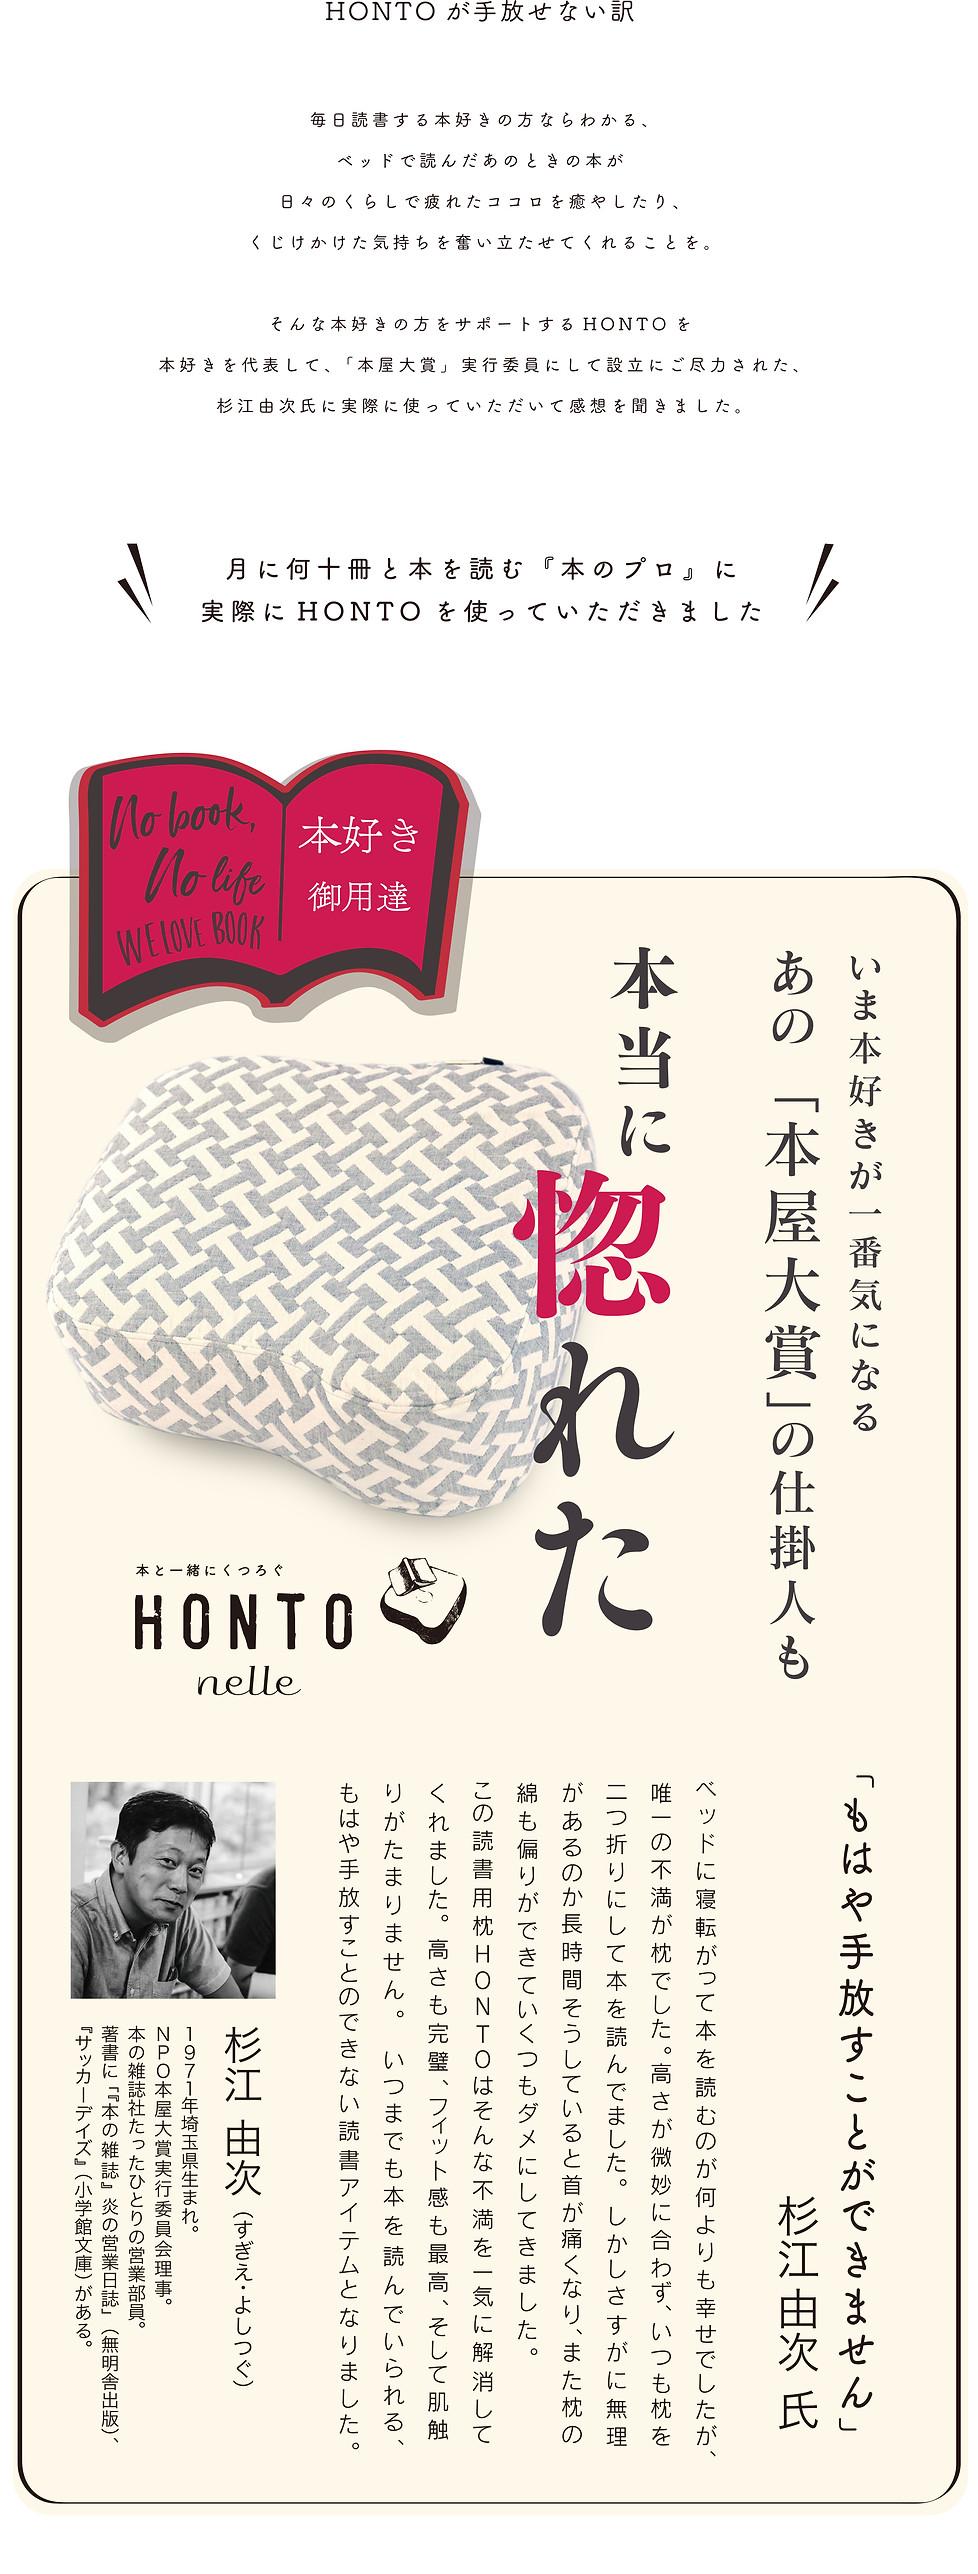 honto_lp10.jpg